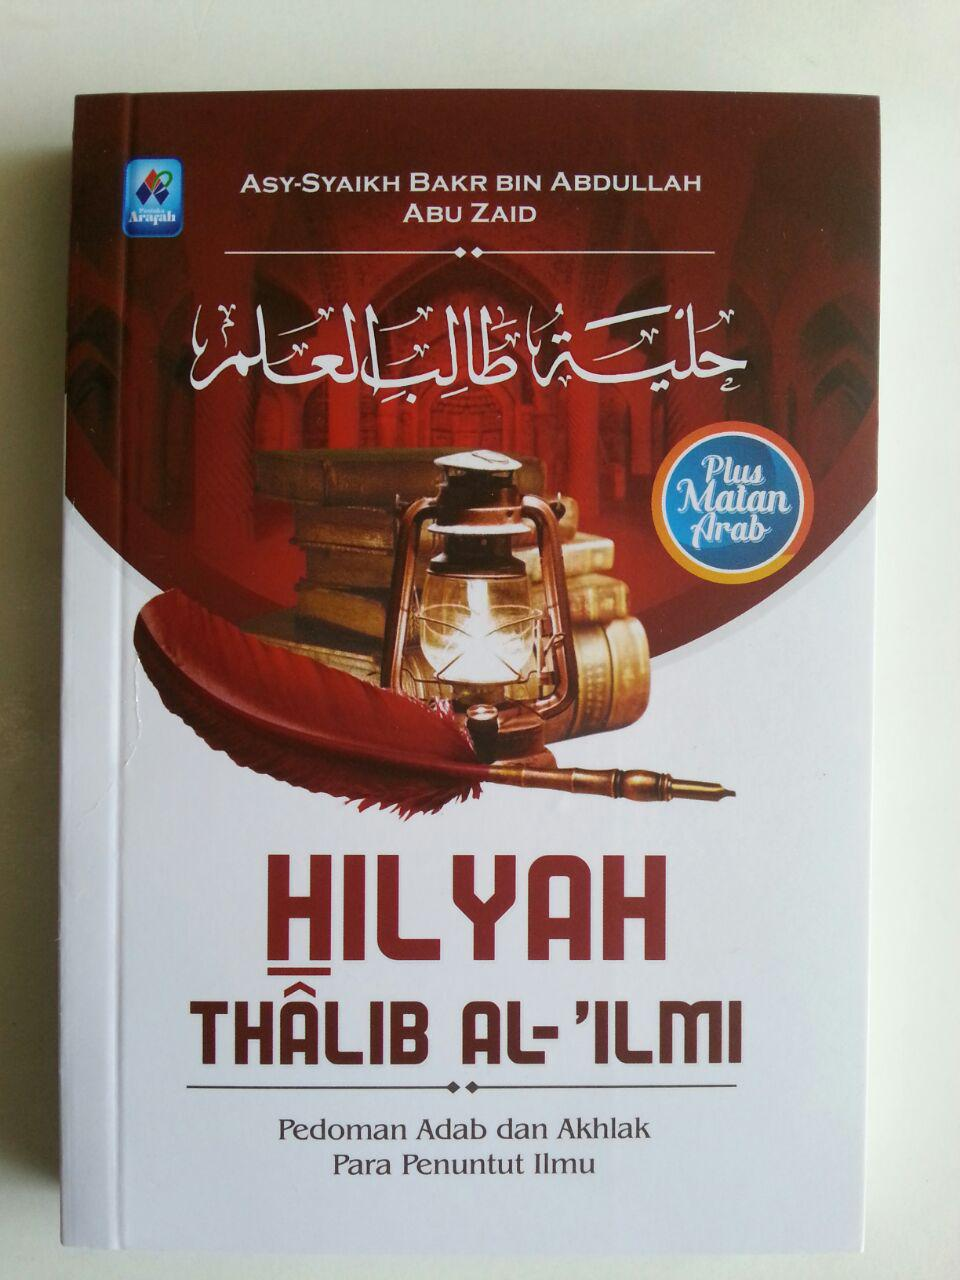 Buku Hilyah Thalib Al-Ilmi Pedoman Adab Akhlak Penuntut Ilmu cover 2